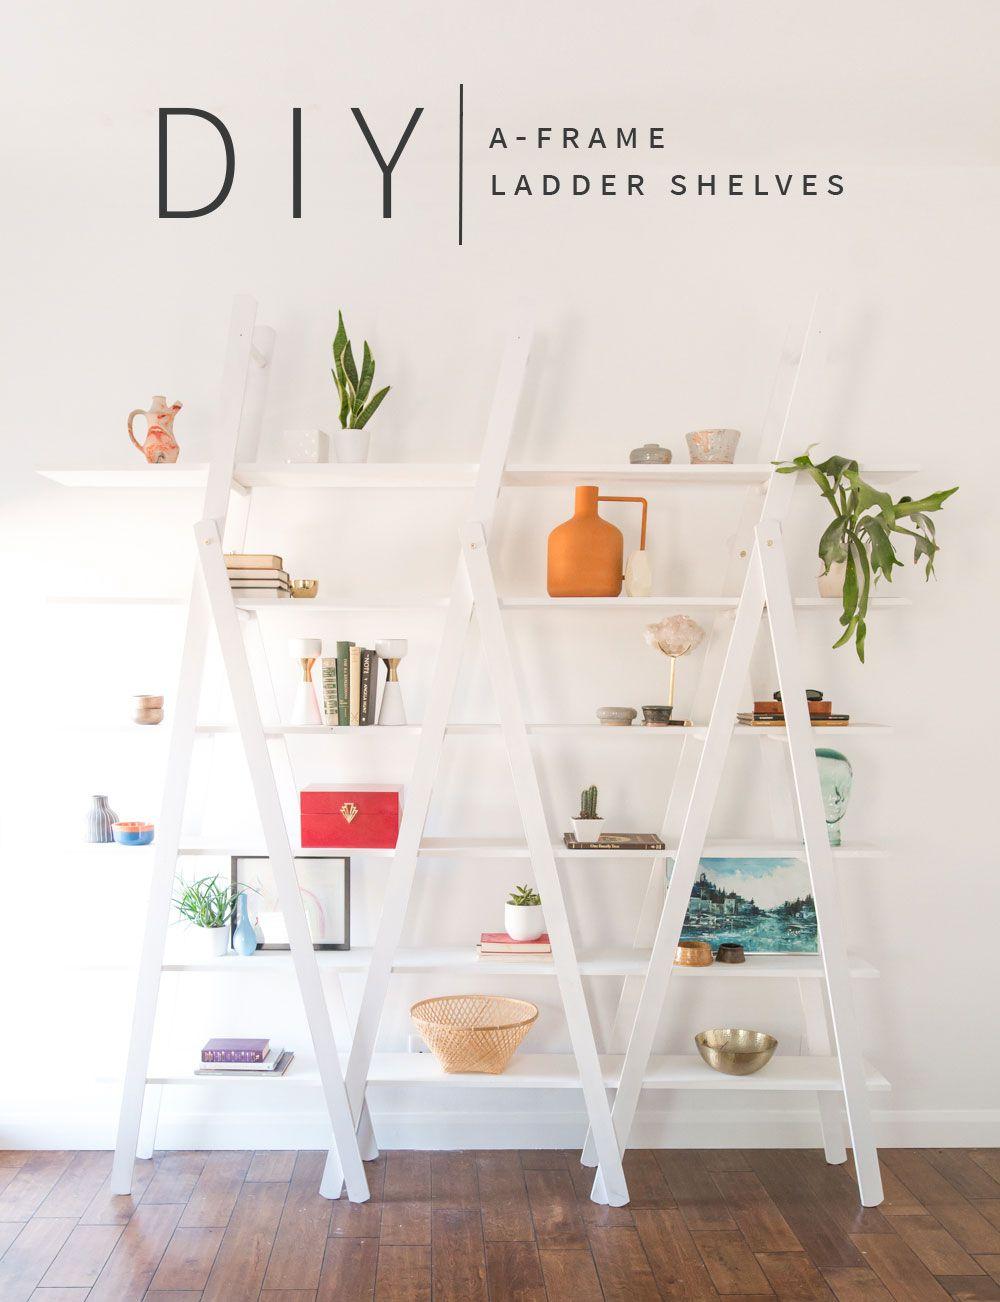 Diy aframe ladder shelves diy pinterest shelves shelving and